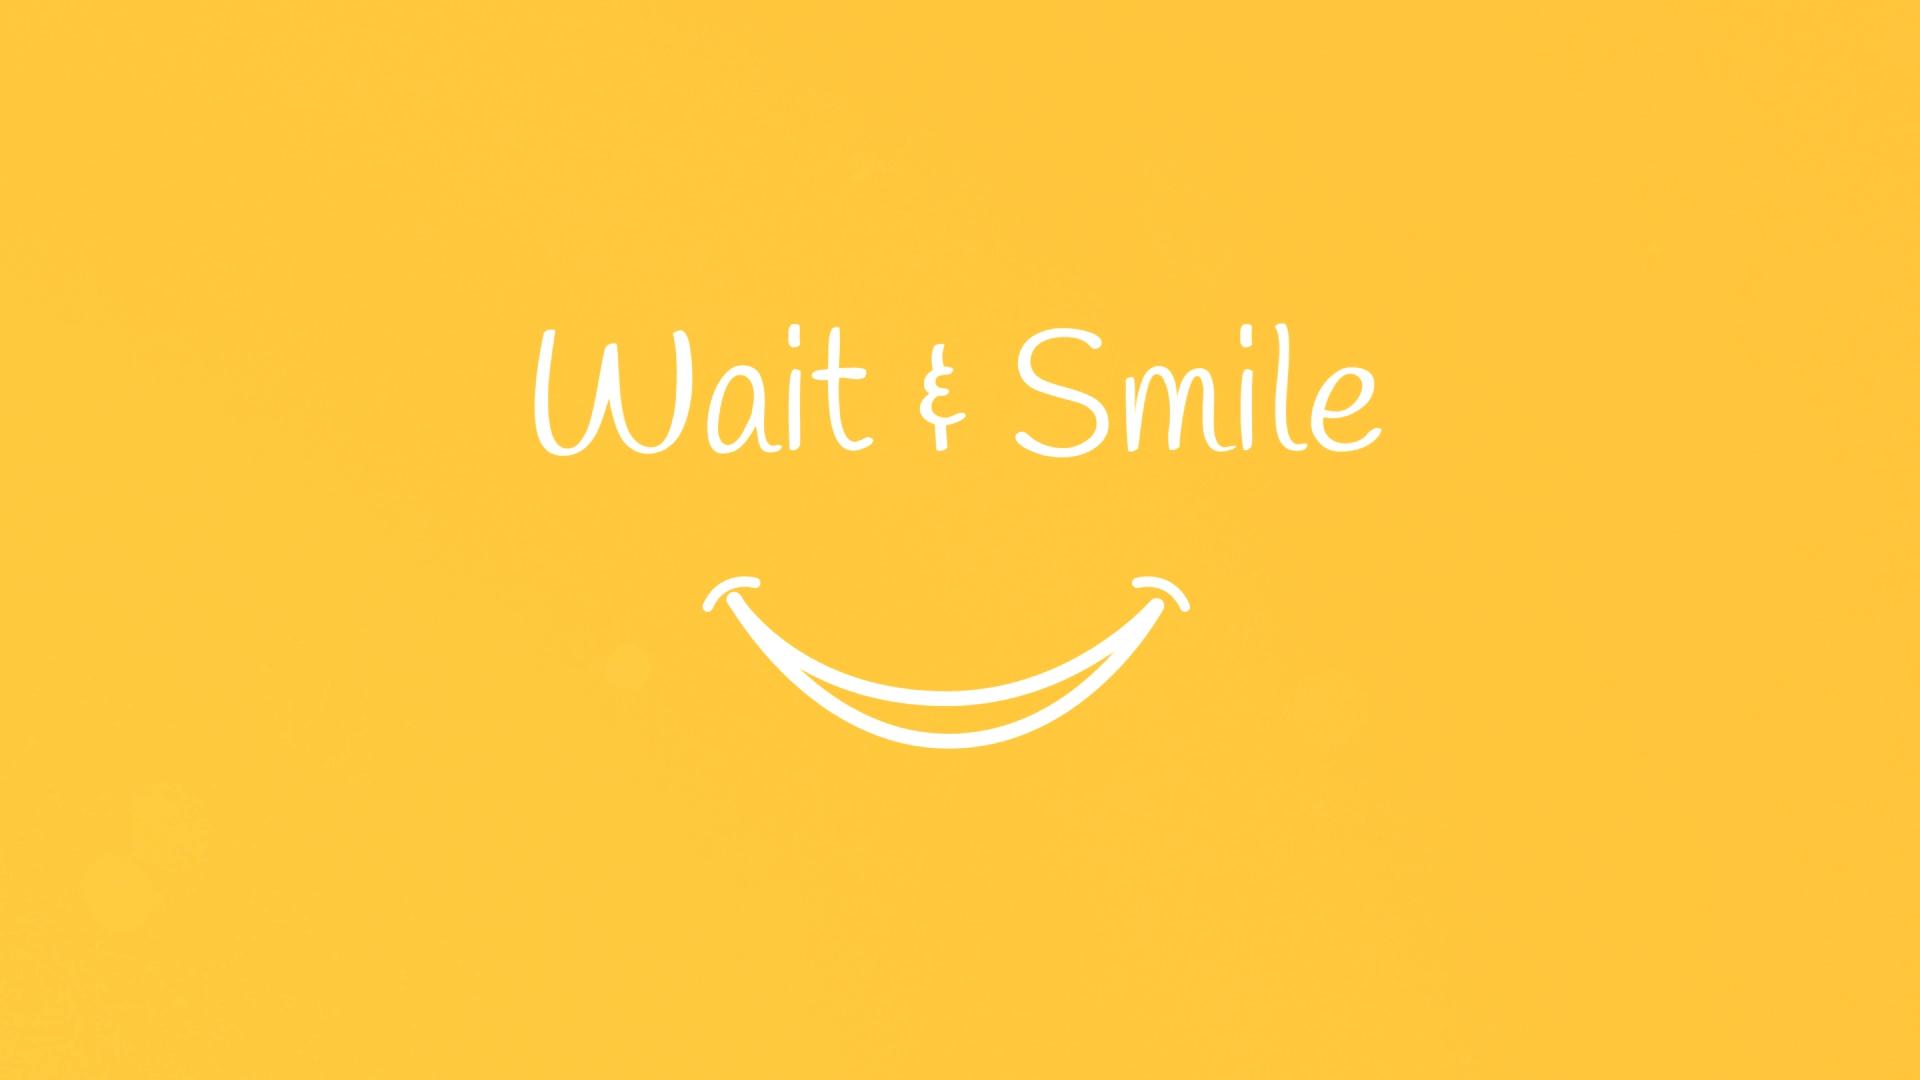 Wait & Smile